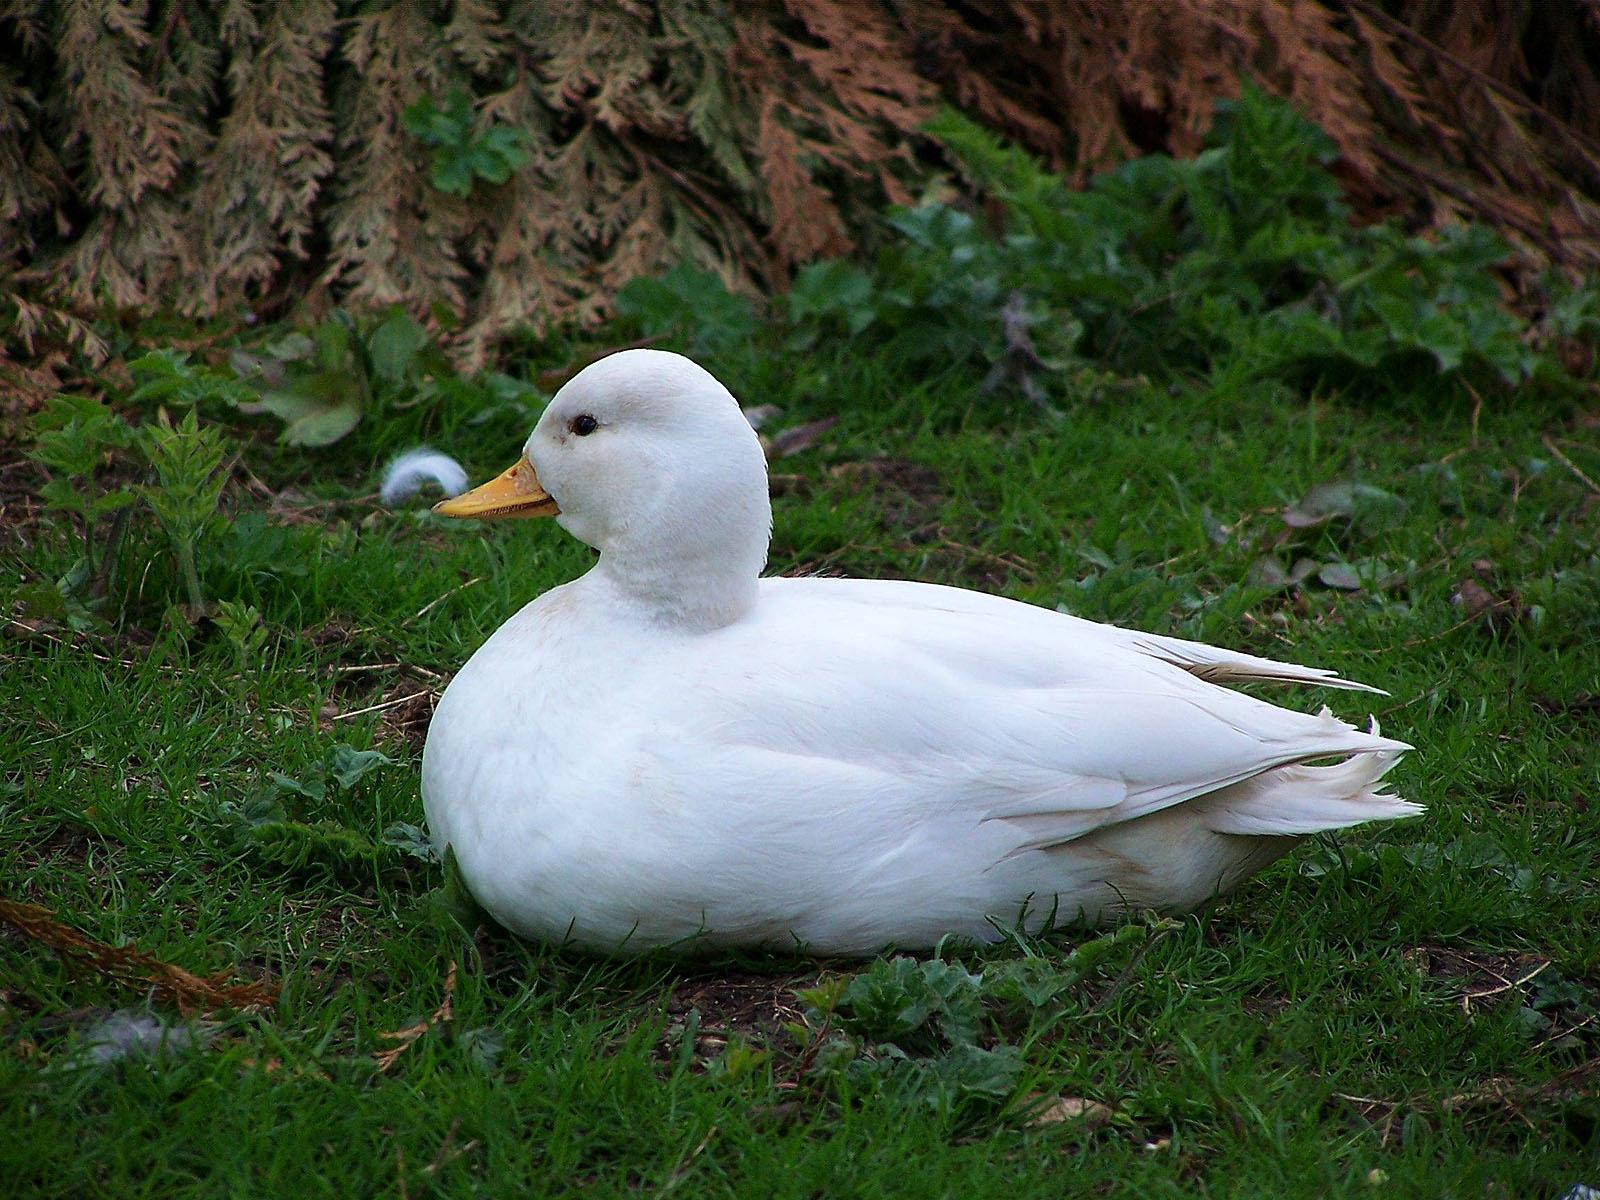 Bird Duck Photo